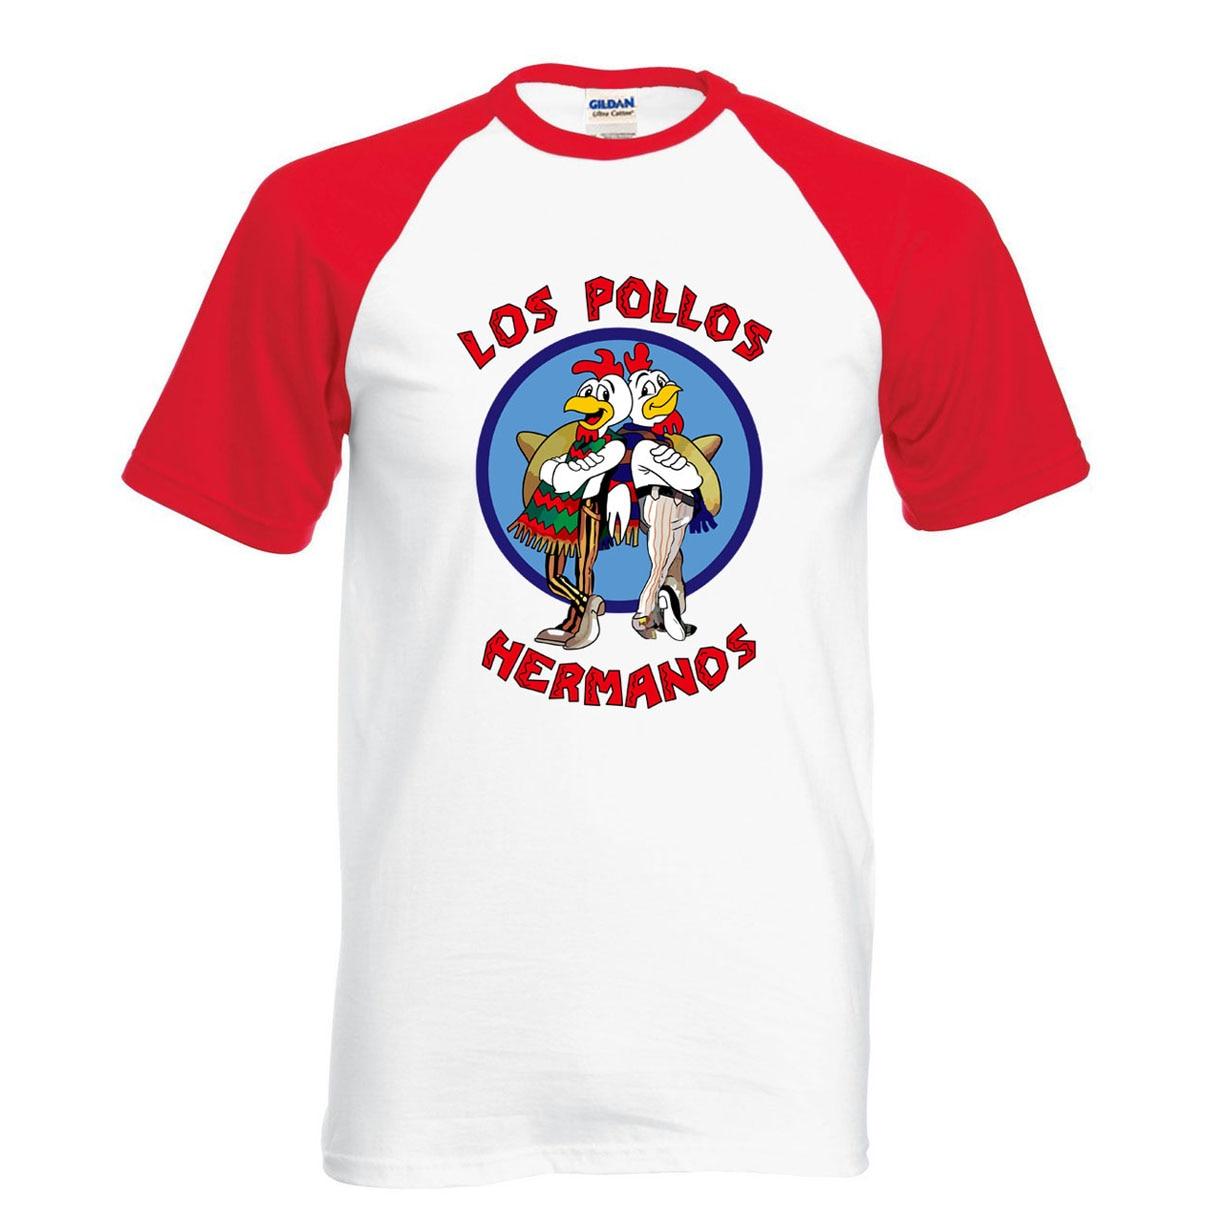 Breaking Bad Shirt LOS POLLOS Hermanos T Shirt Chicken Brothers 2019 hot sale summer 100% cotton fashion raglan tee for fans